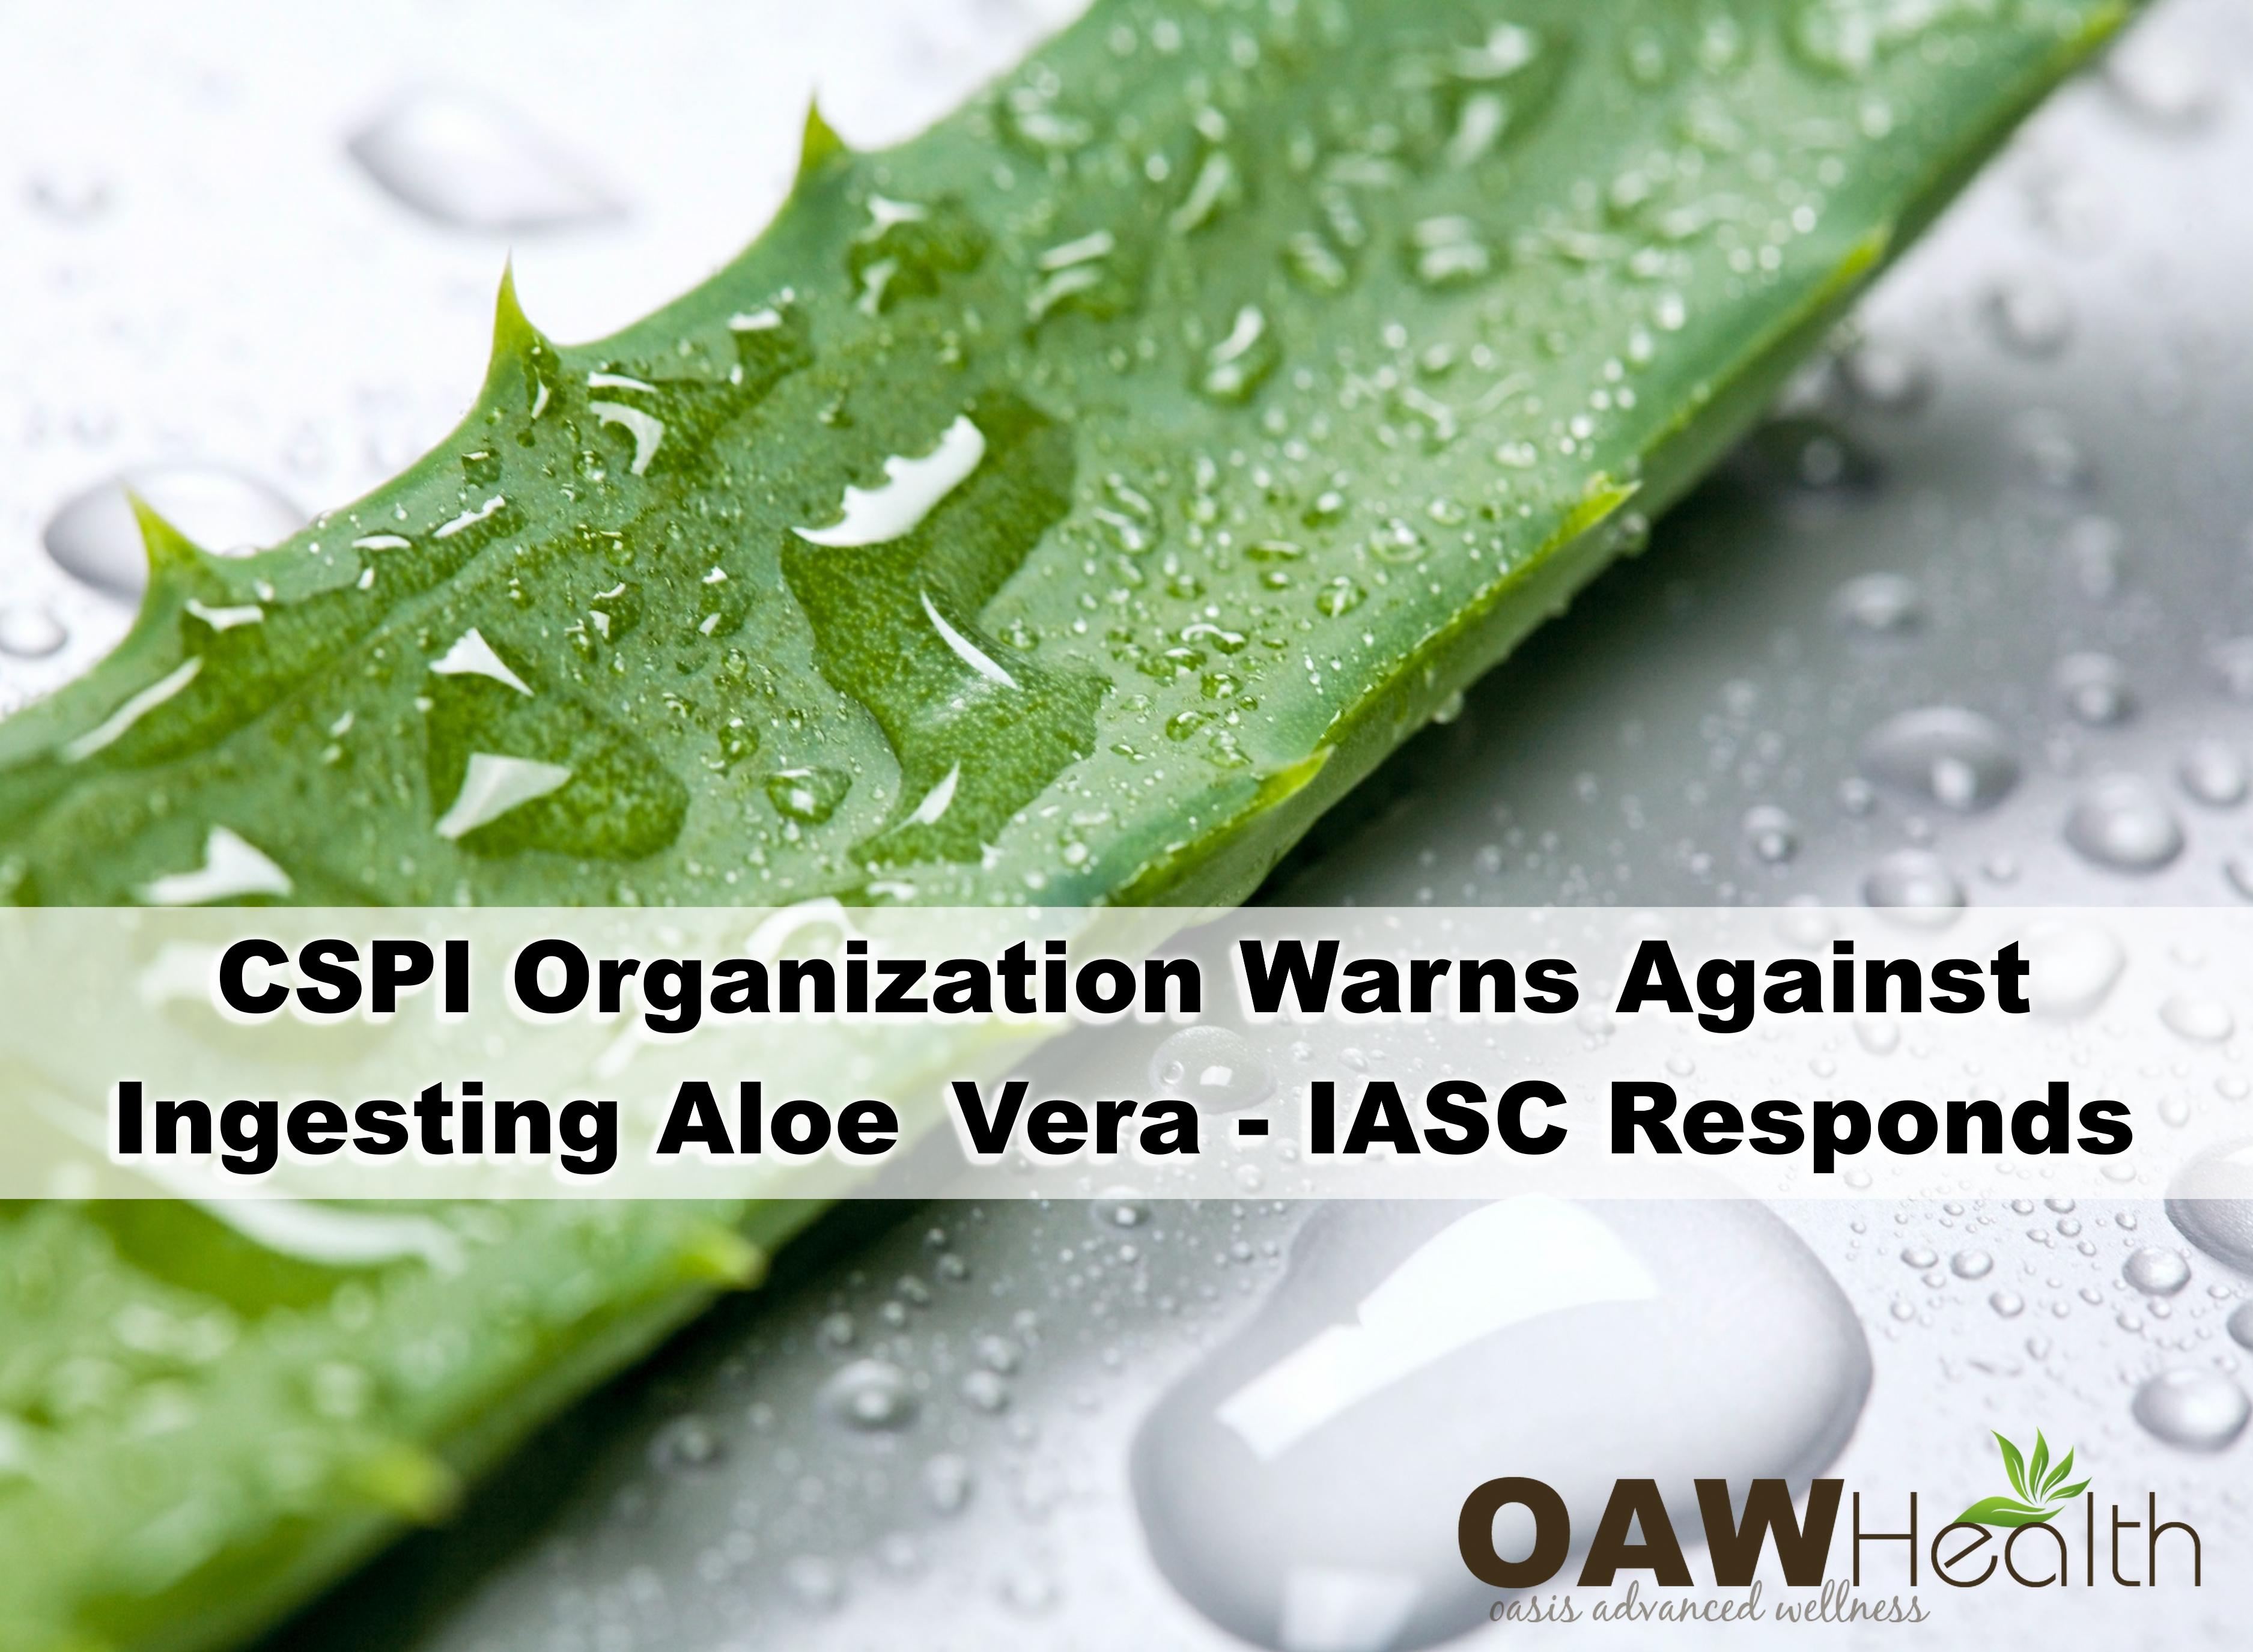 CSPI Organization Warns Against Ingesting Aloe Vera – IASC Responds